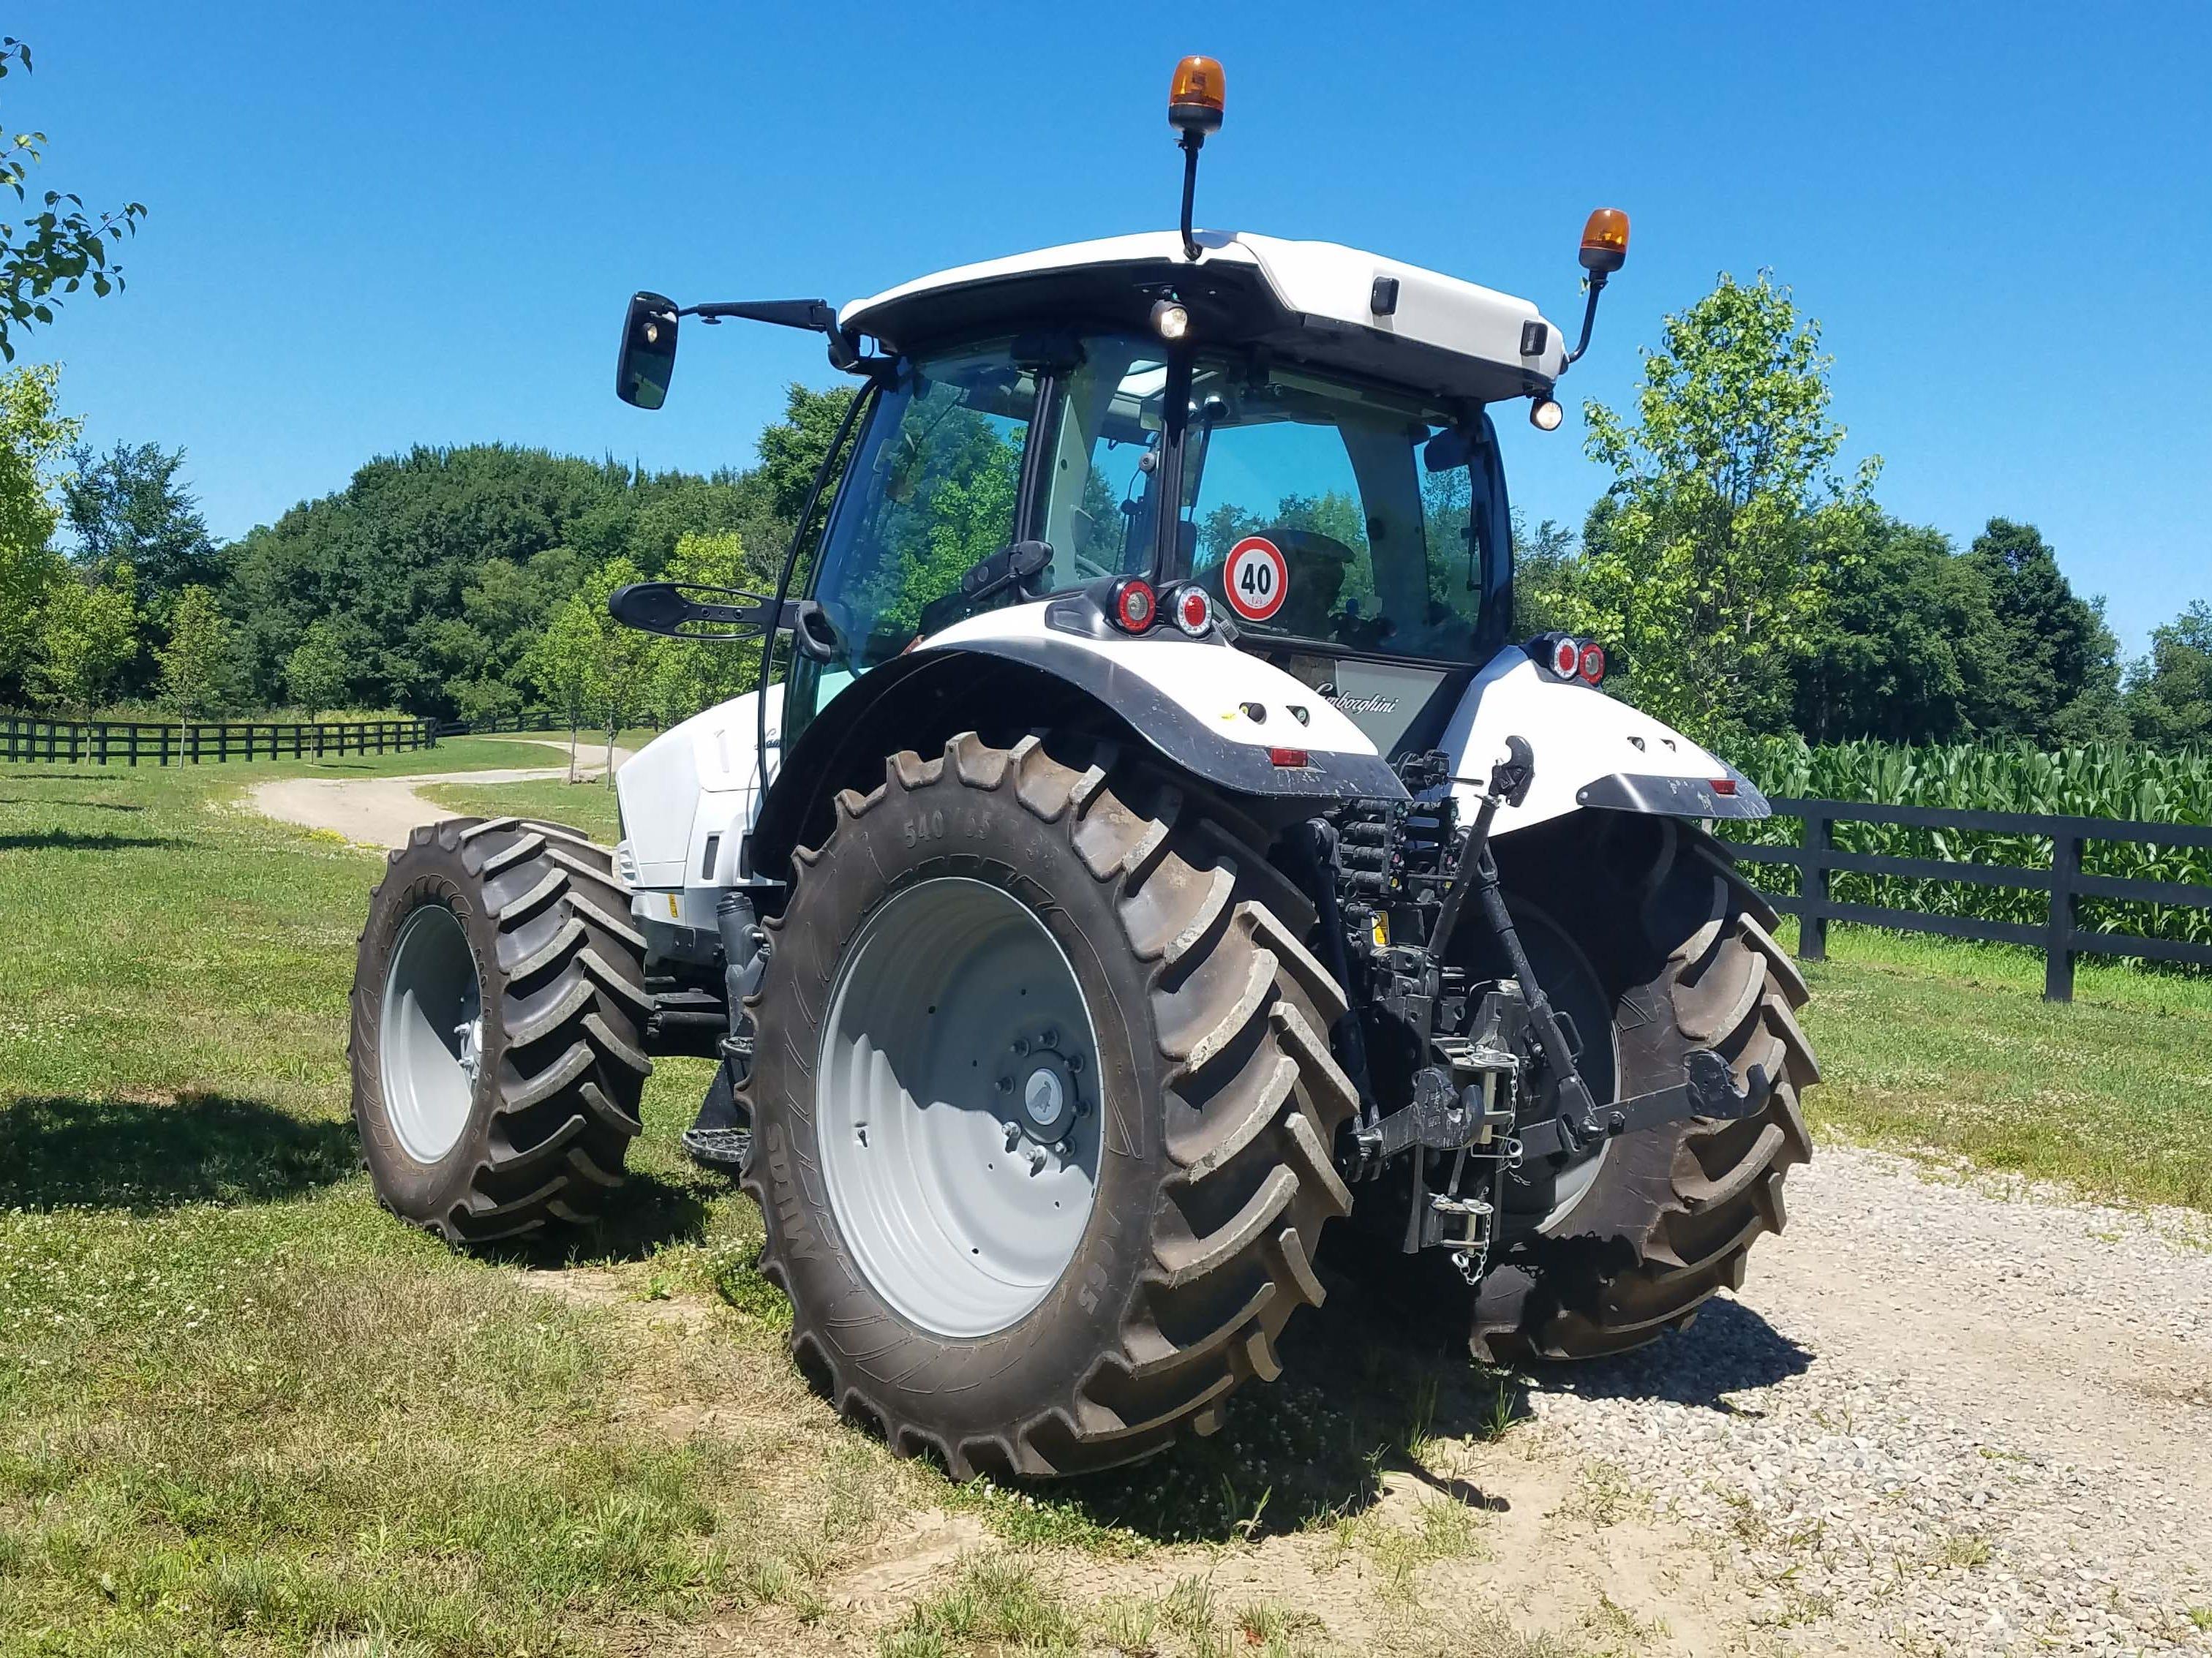 What, no scissor doors? Unlike its Lamborghini Aventador sibling, the Nitro farm tractor has excellent, 360-degree visibility.